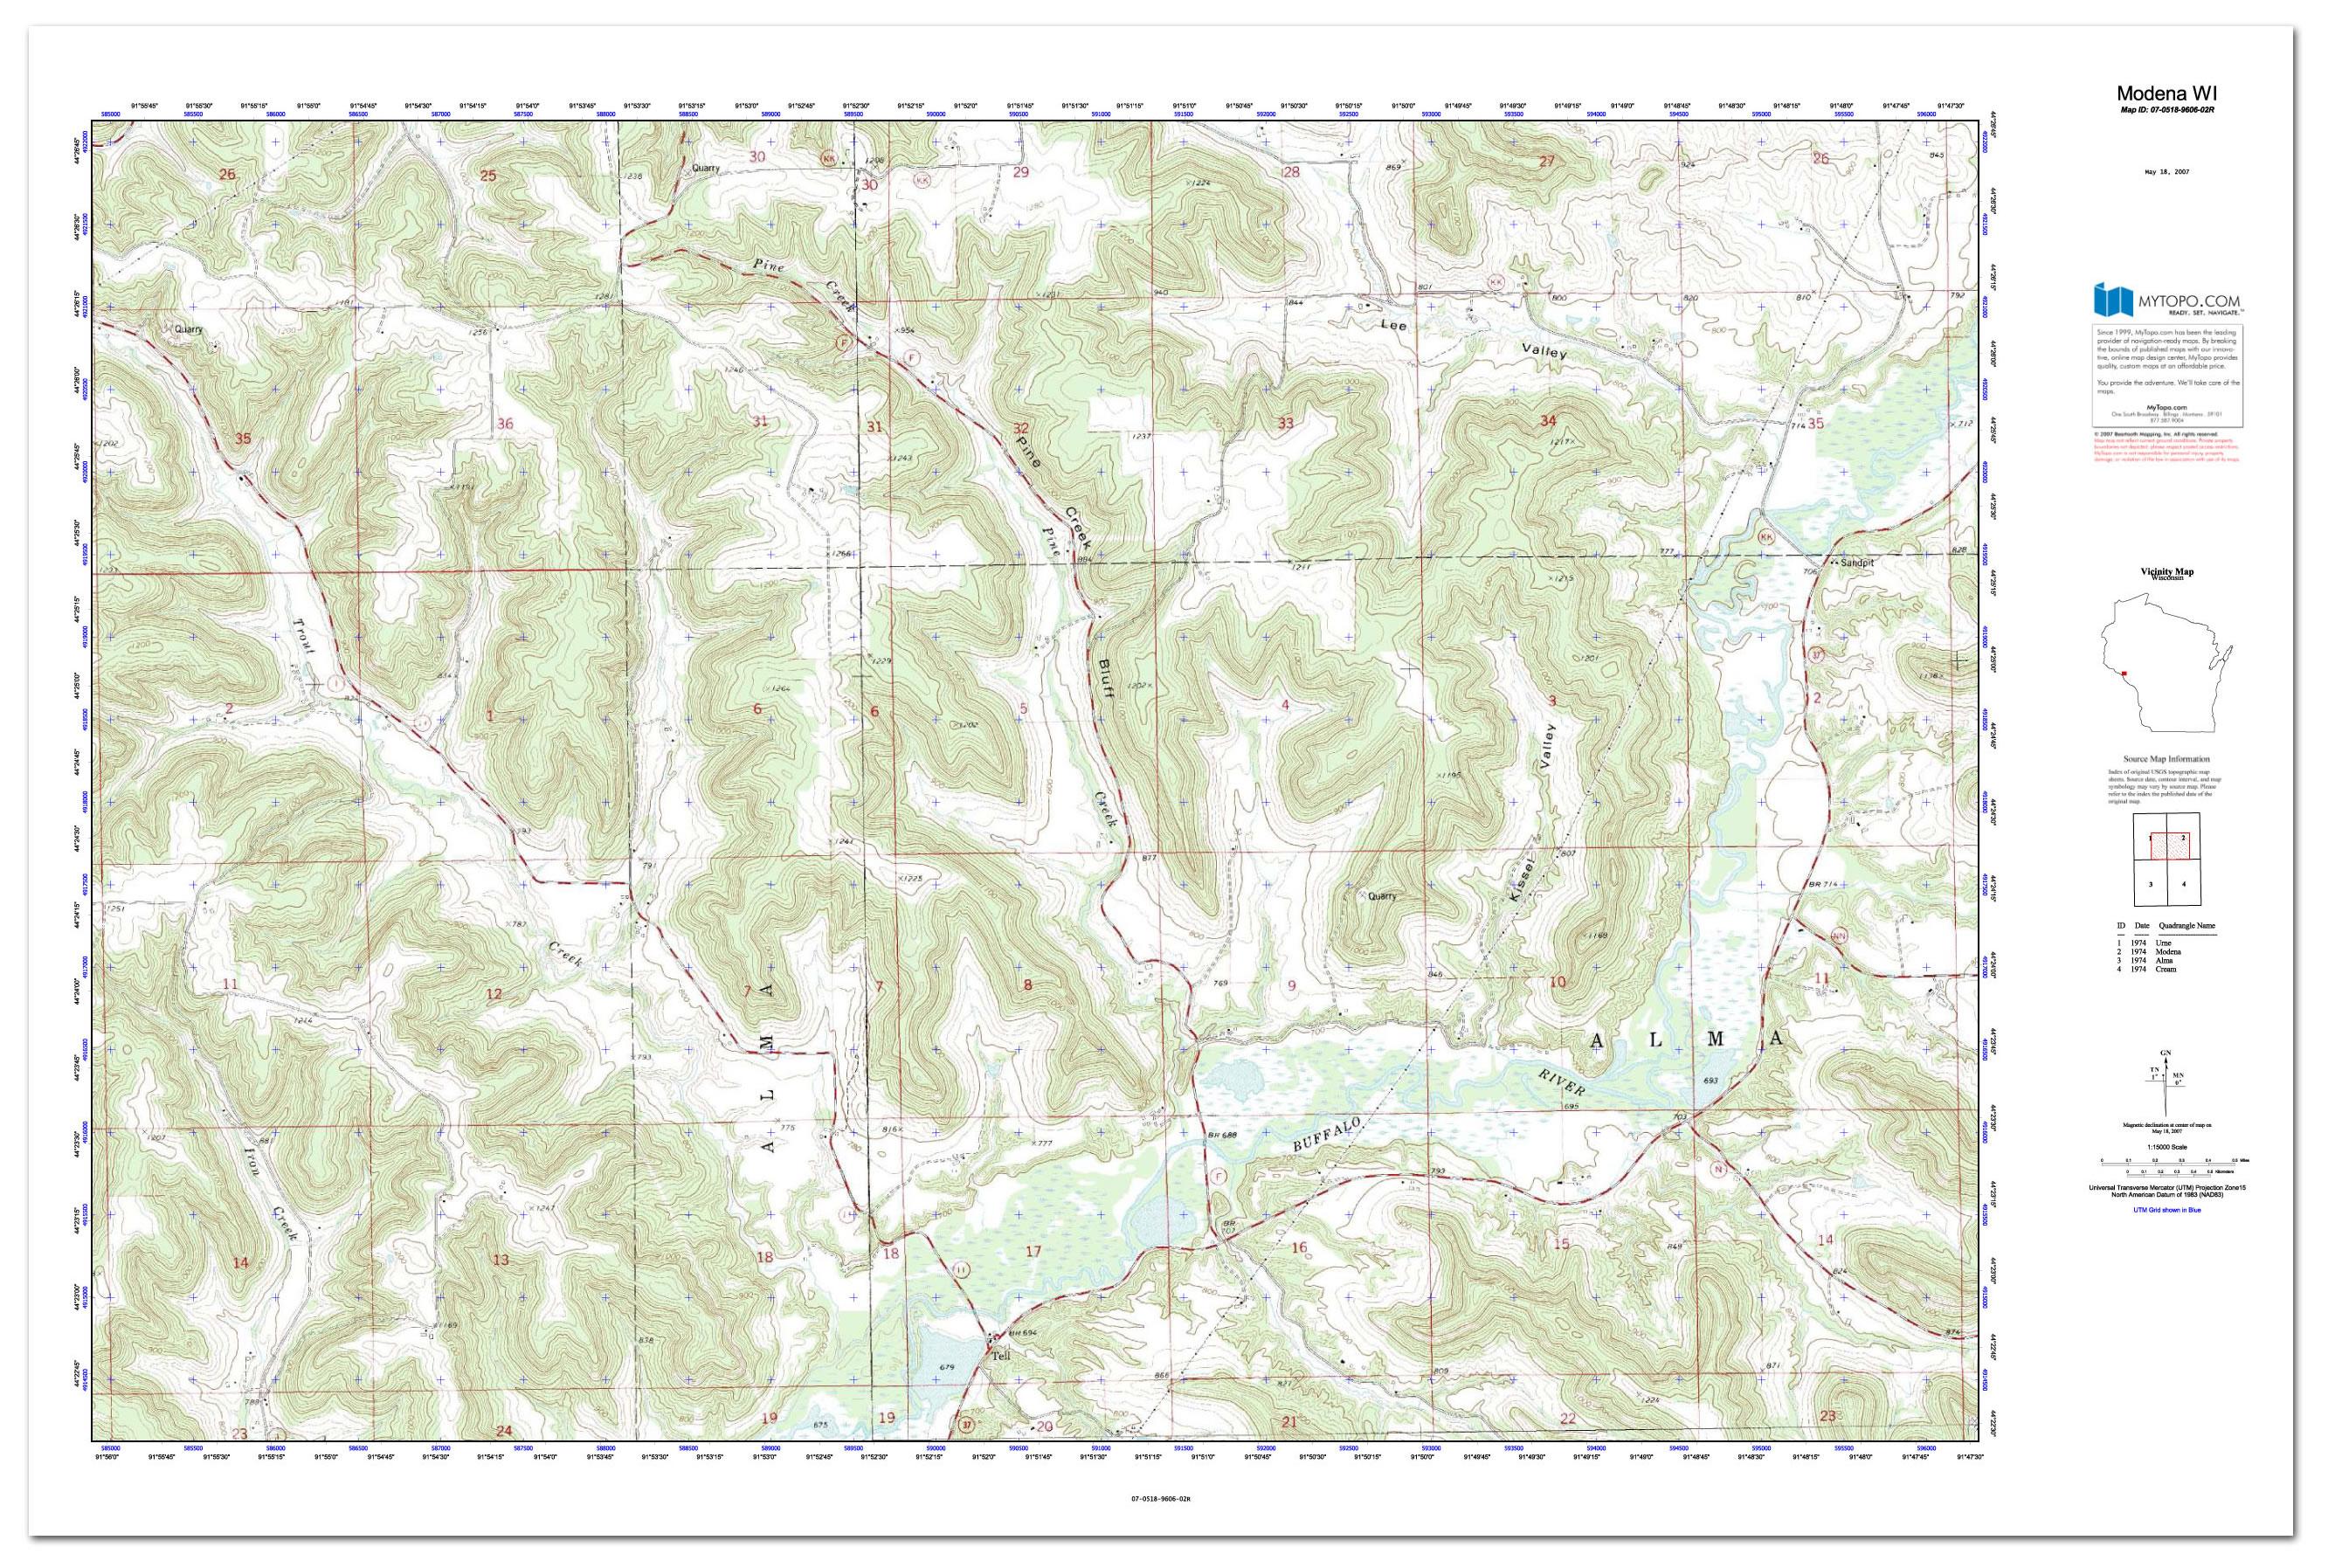 Custom Printed Topo Maps Custom Printed Aerial Photos - Mgrs maps for sale